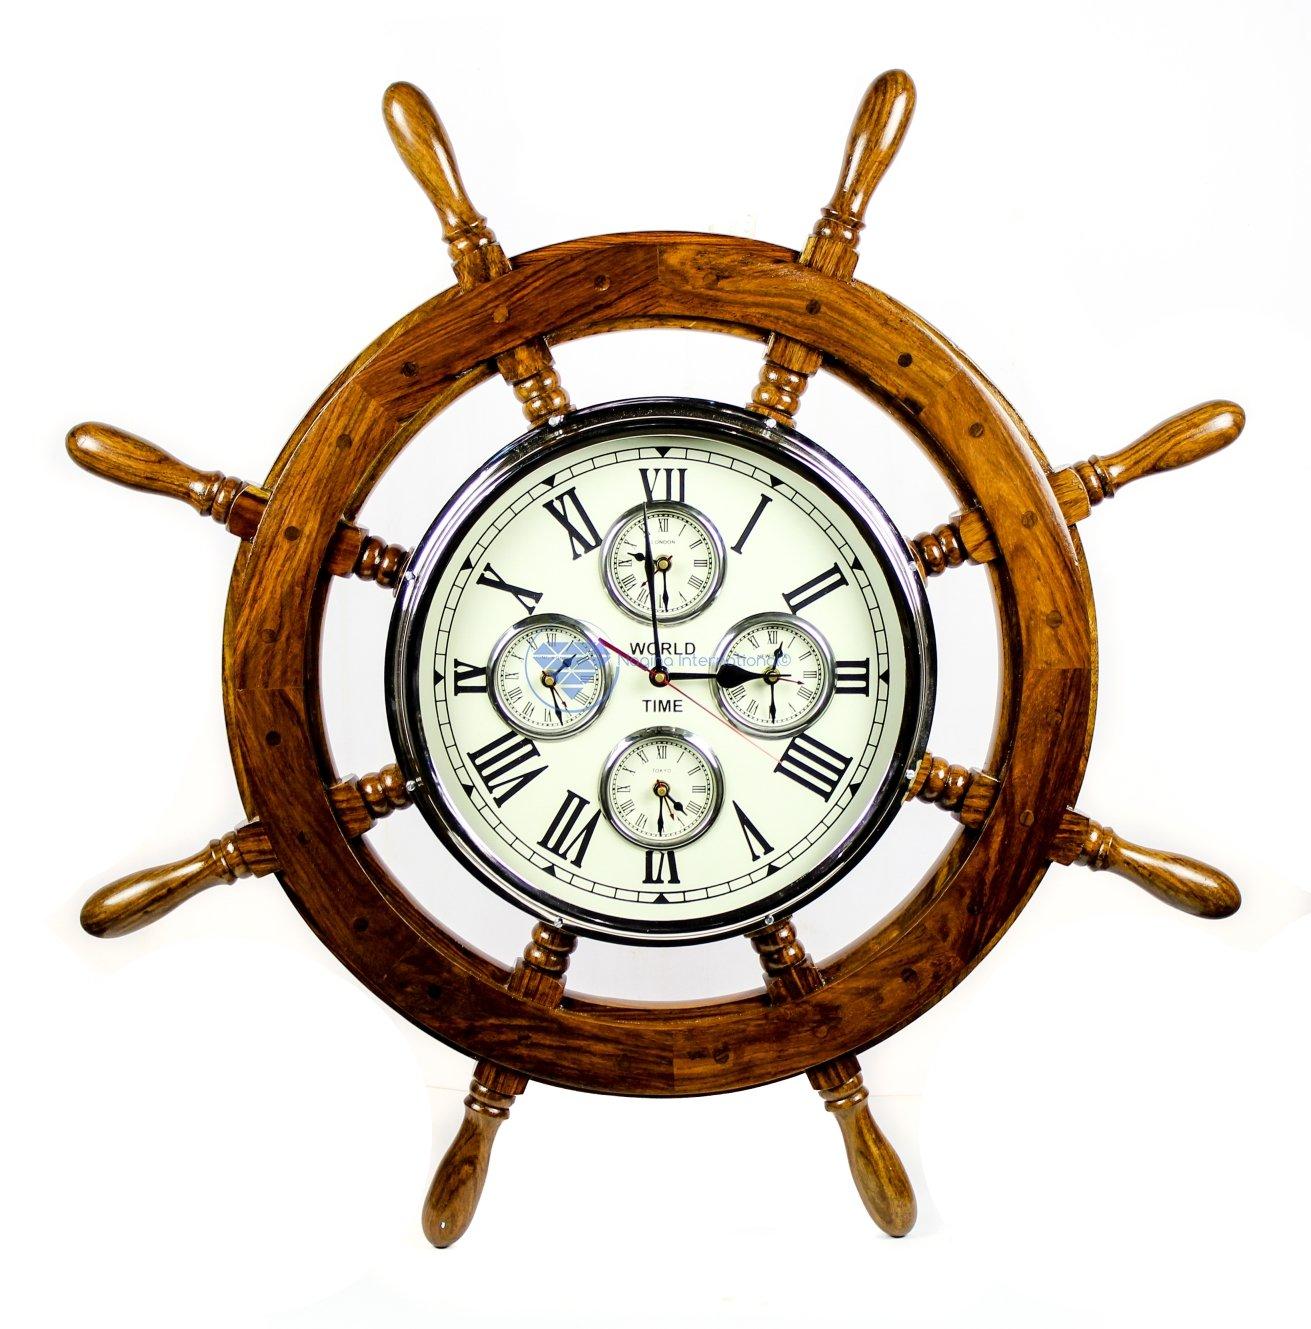 30'' Premium Mahogany Crafted Large Nautical Ship's Wheel Times World Clock   Nautical Home Decor & Gifts   Nagina International (30 Inches, Rosewood)